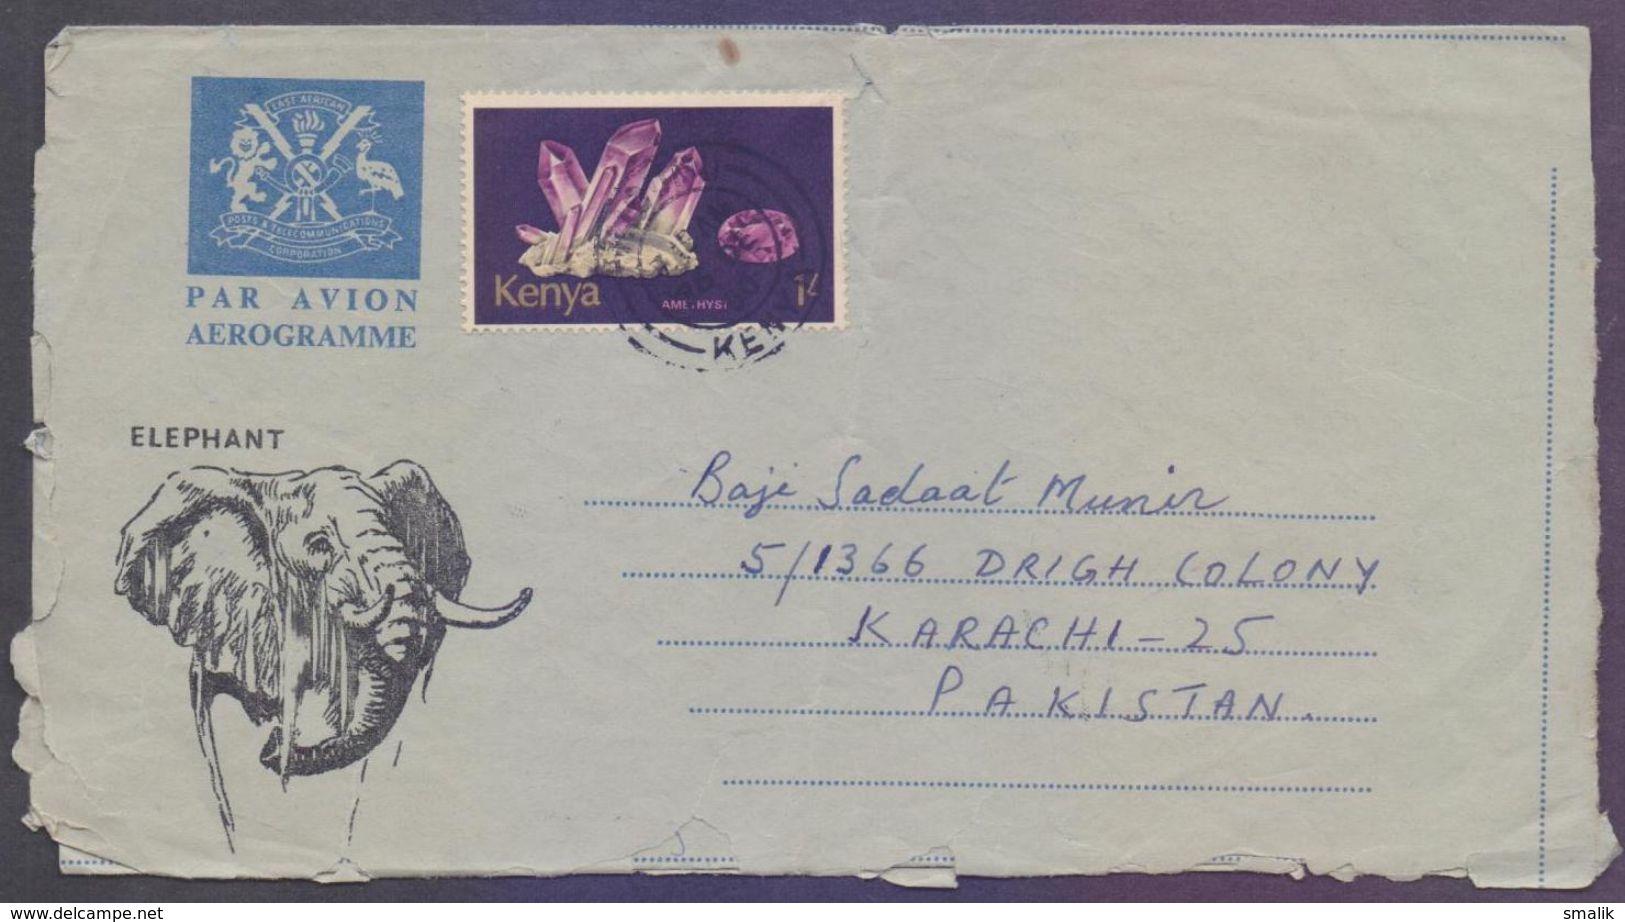 KENYA Postal History Aerogramme Elephant, Used 1980 - Kenia (1963-...)